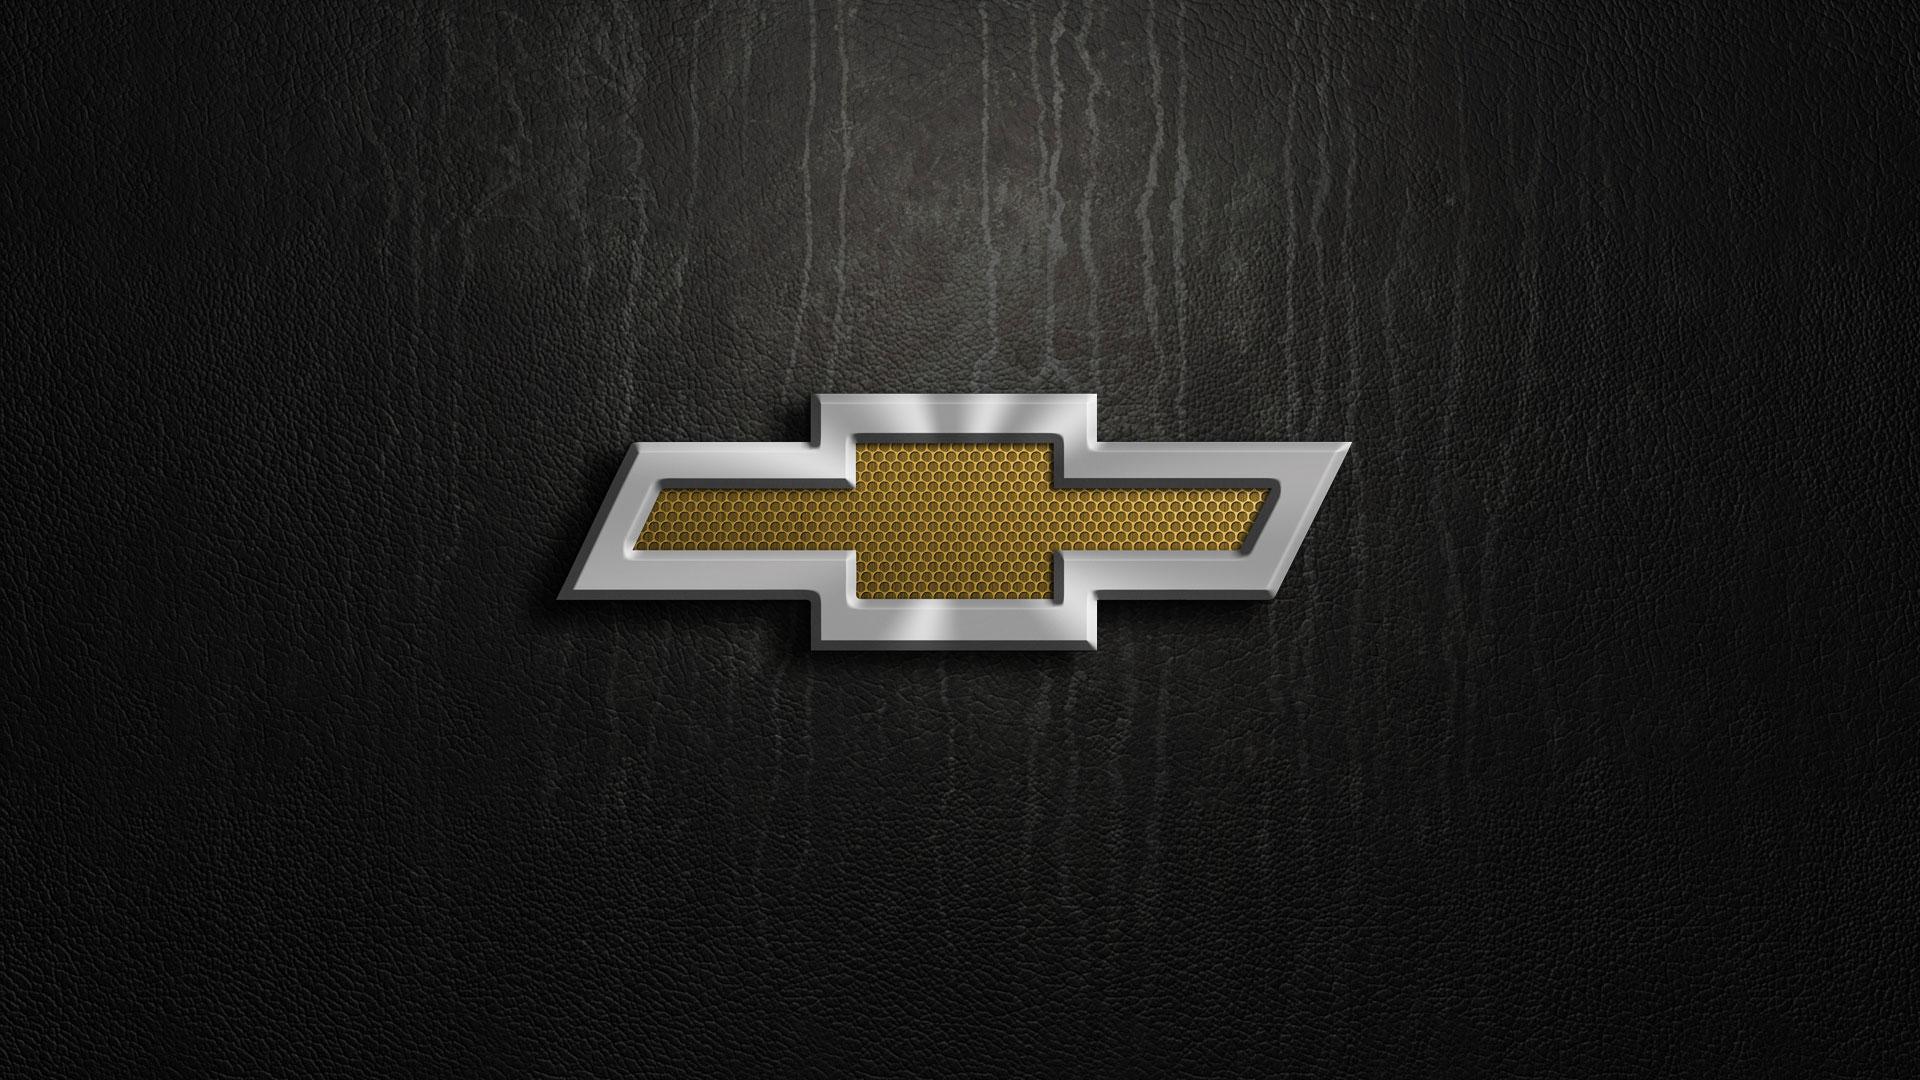 Logo HD Wallpapers 7498 HD Wallpaper 3D Desktop Backgrounds 1920x1080